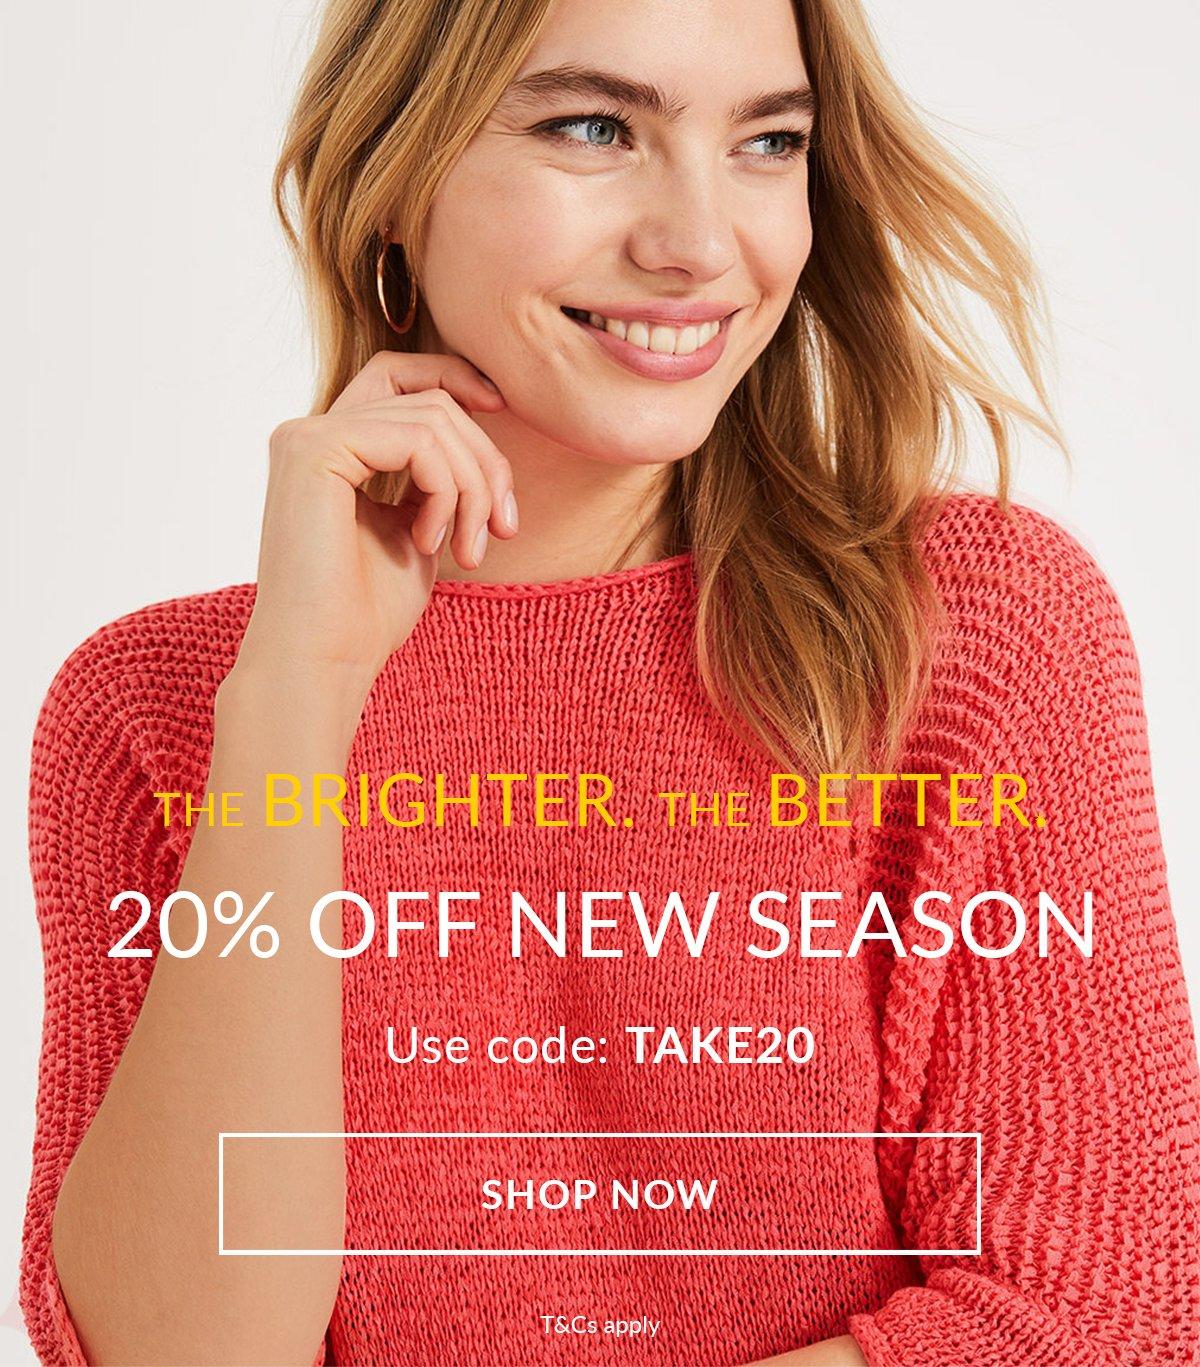 20% off new season Shop now